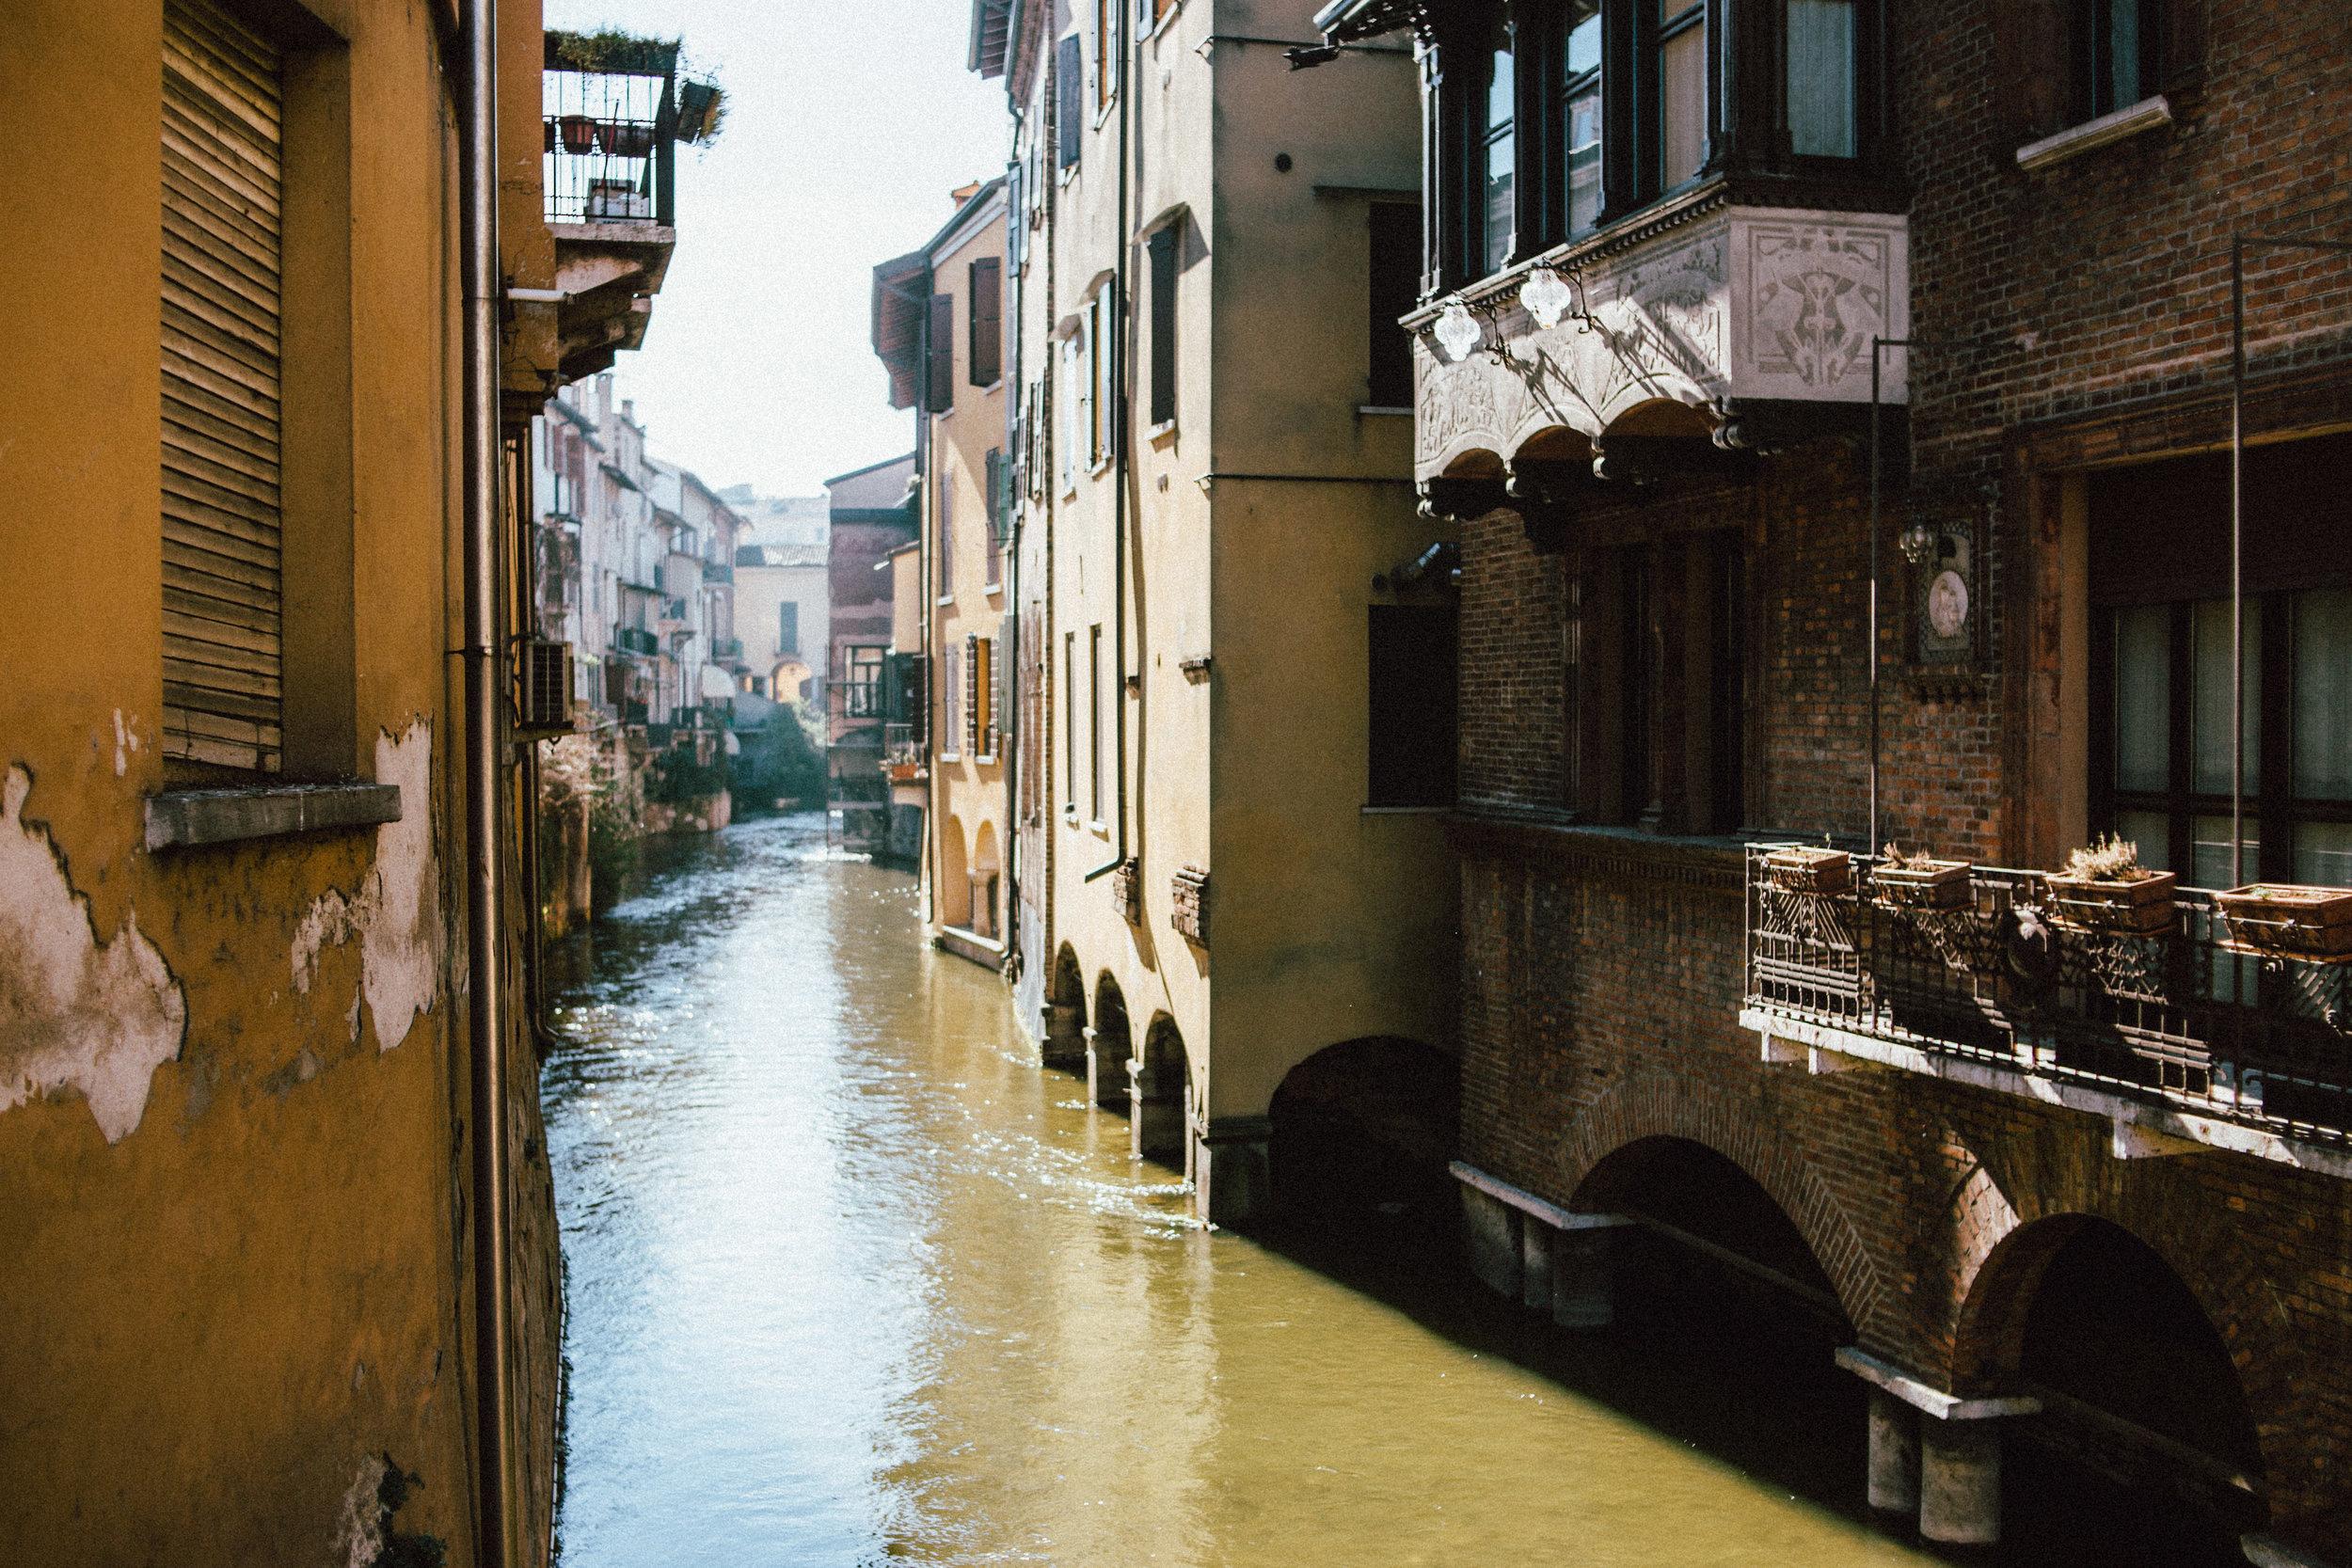 003 - Mantova.jpg